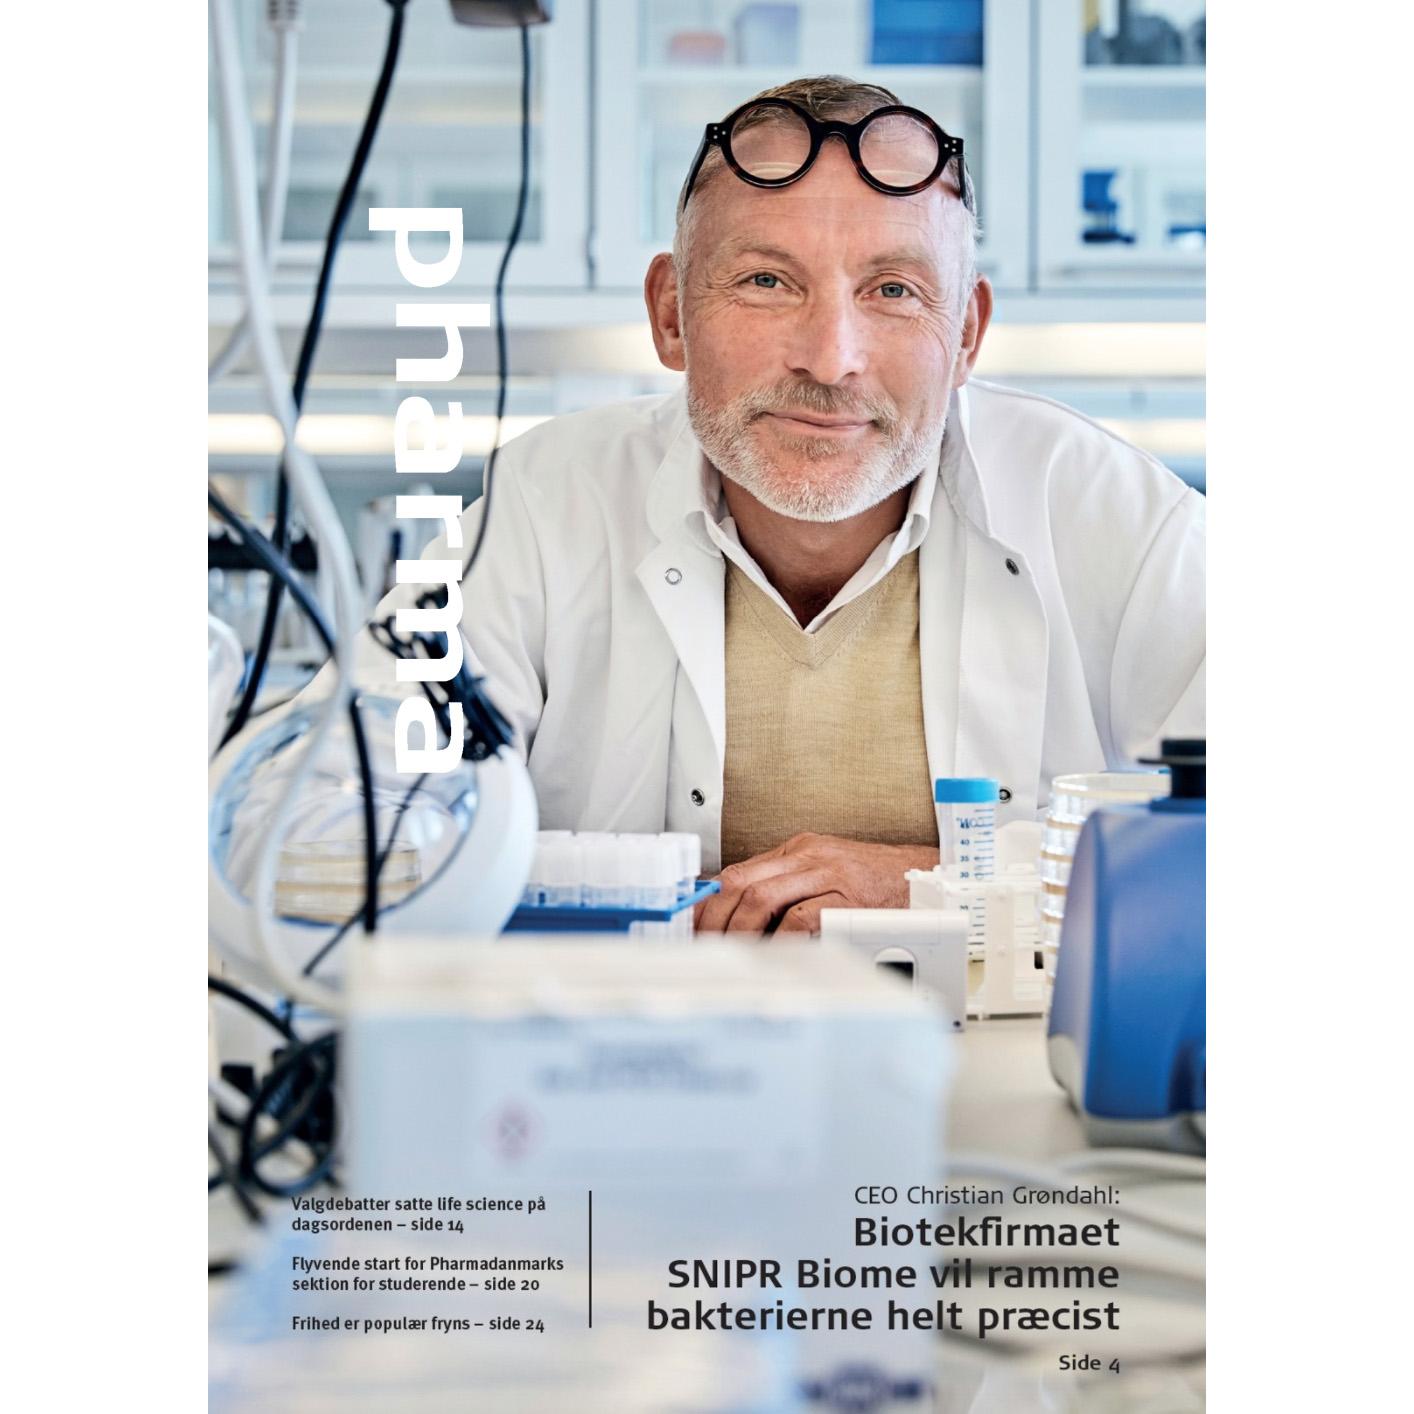 SNIPR_Biome_Pharma.jpg